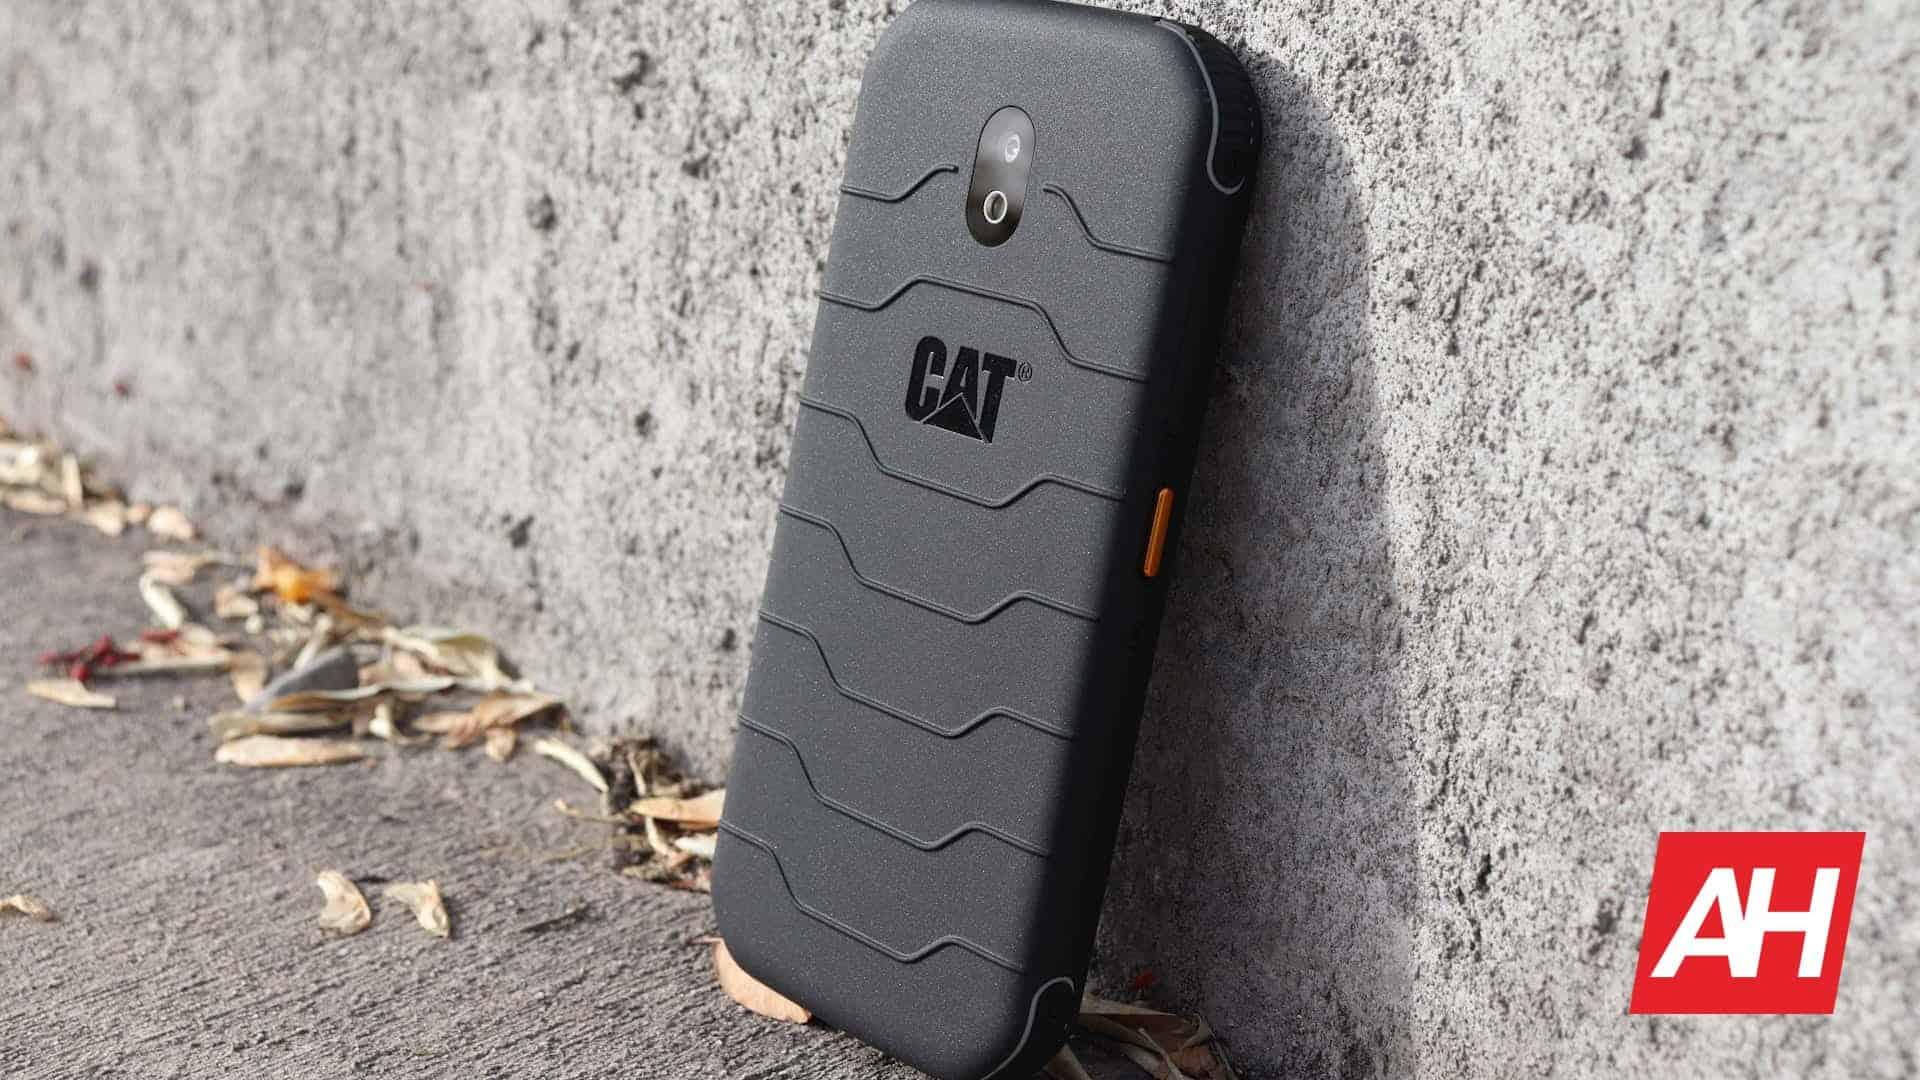 01 0 CAT S42 Review hardware DG AH 2020